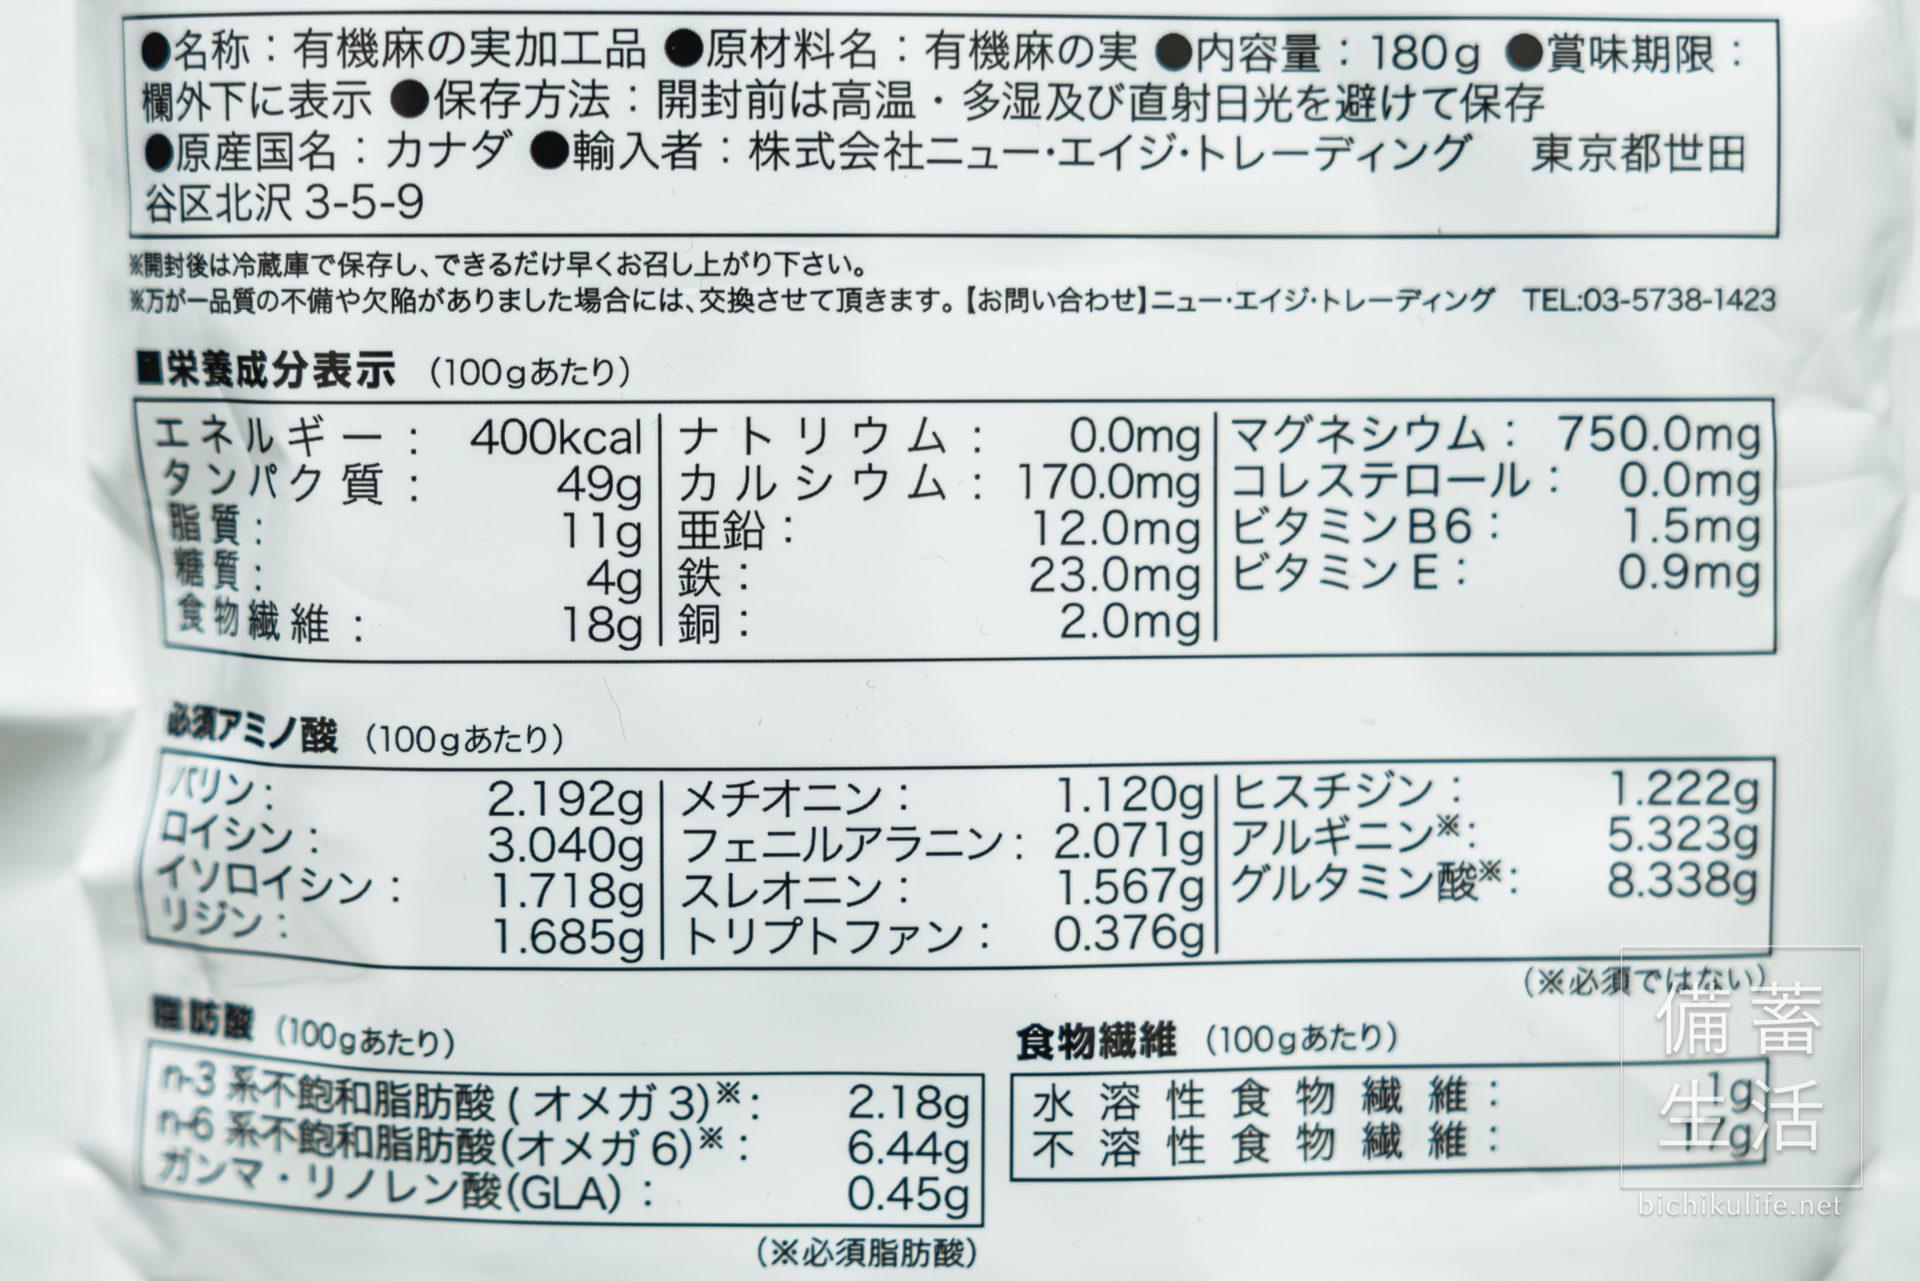 Hemp Kitchen(ヘンプキッチン)の有機ヘンプパウダー、麻の実たんぱく(粉末)の栄養成分、商品説明